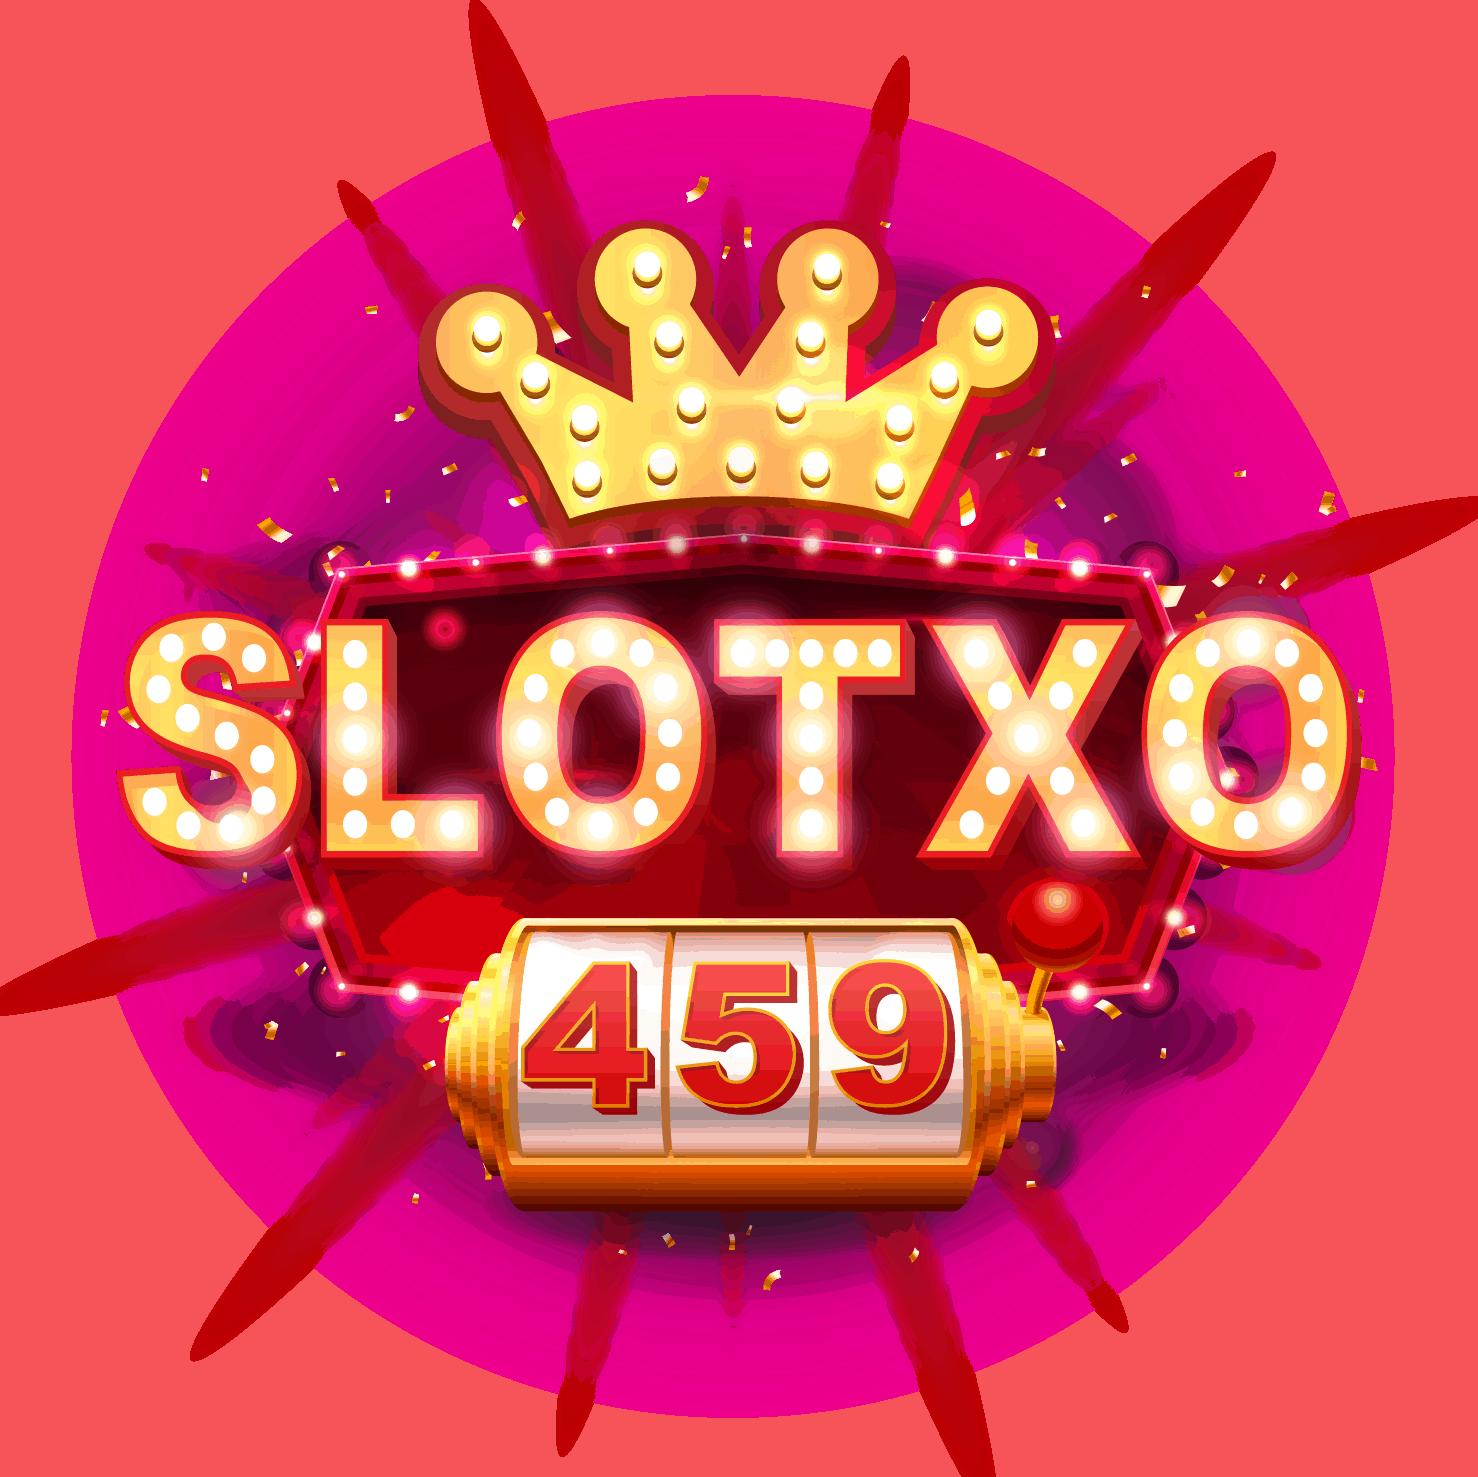 SlotXO